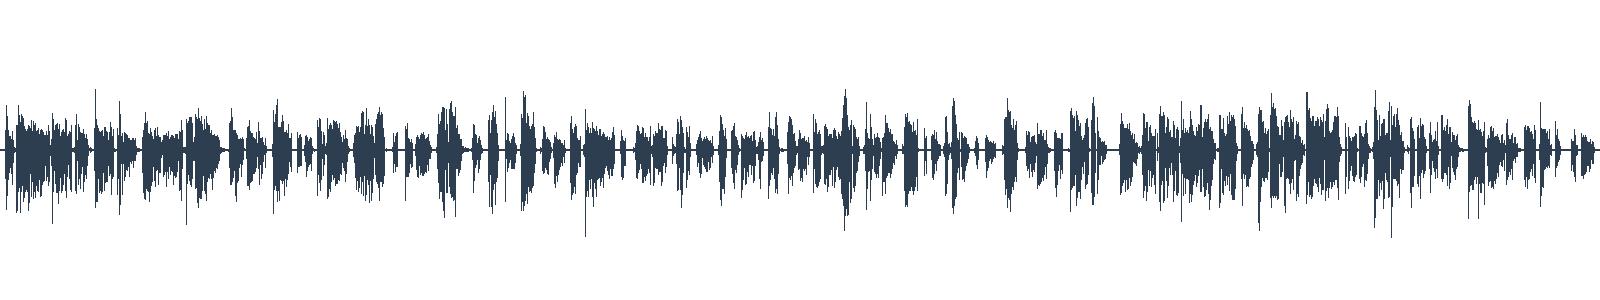 Hlava XXII waveform